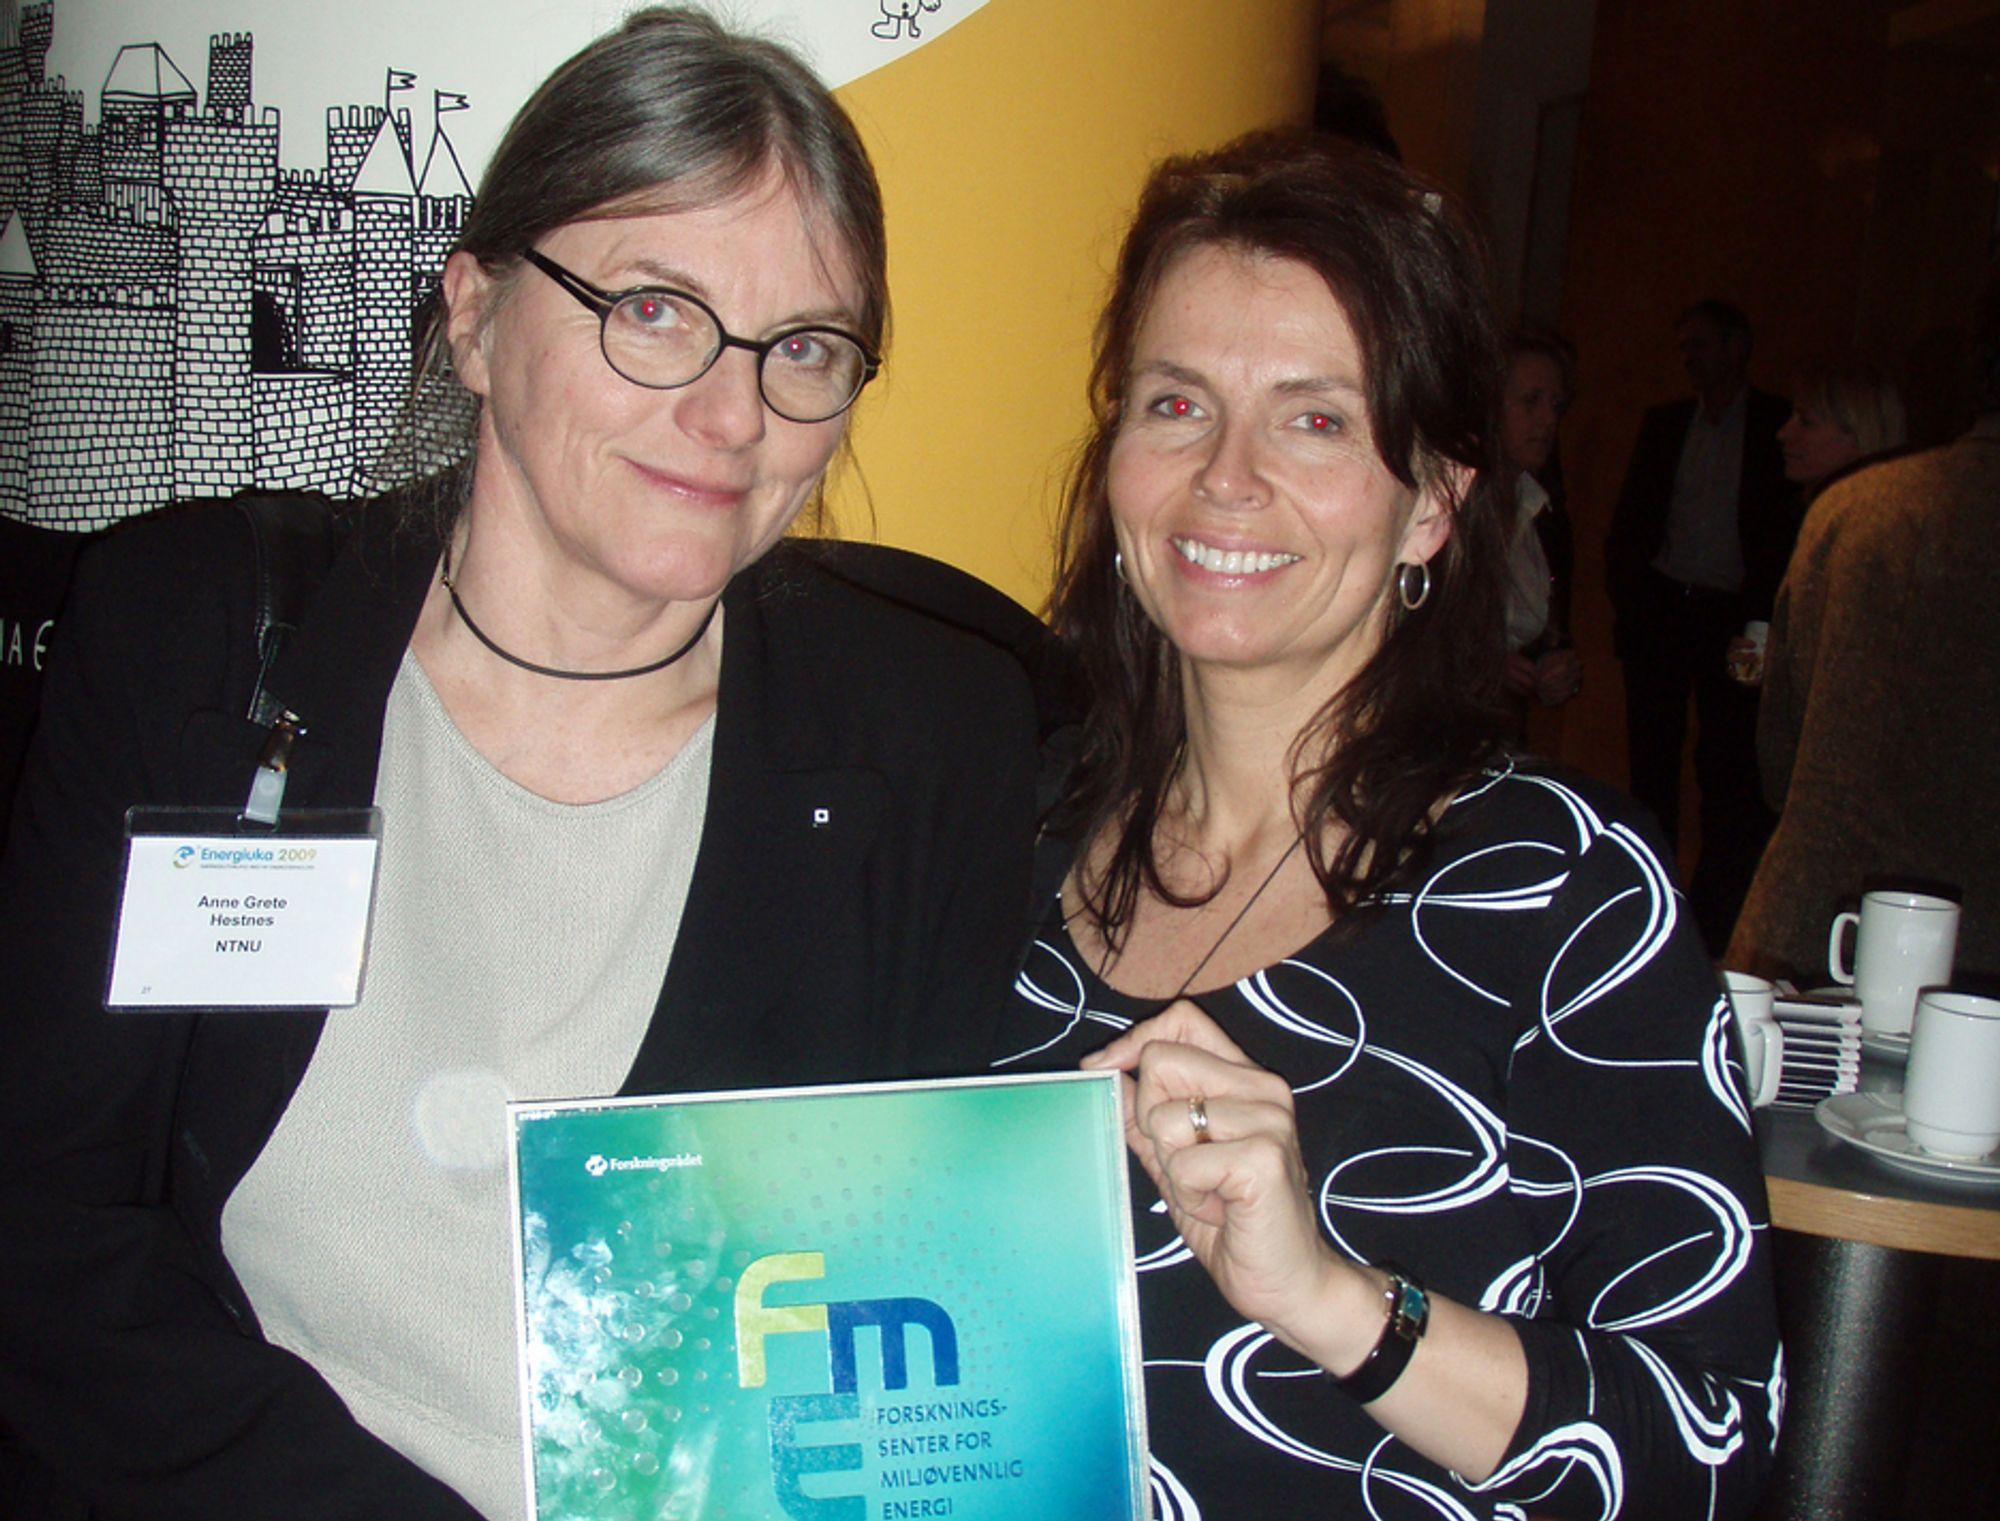 GLEDER SEG: Professor ved NTNU, Anne Grete Hestnes (t.v.), og forskningsleder ved SINTEF Byggforsk, Marit Thyholt, skal lede forskningssenteret Zero Emission Buildings.